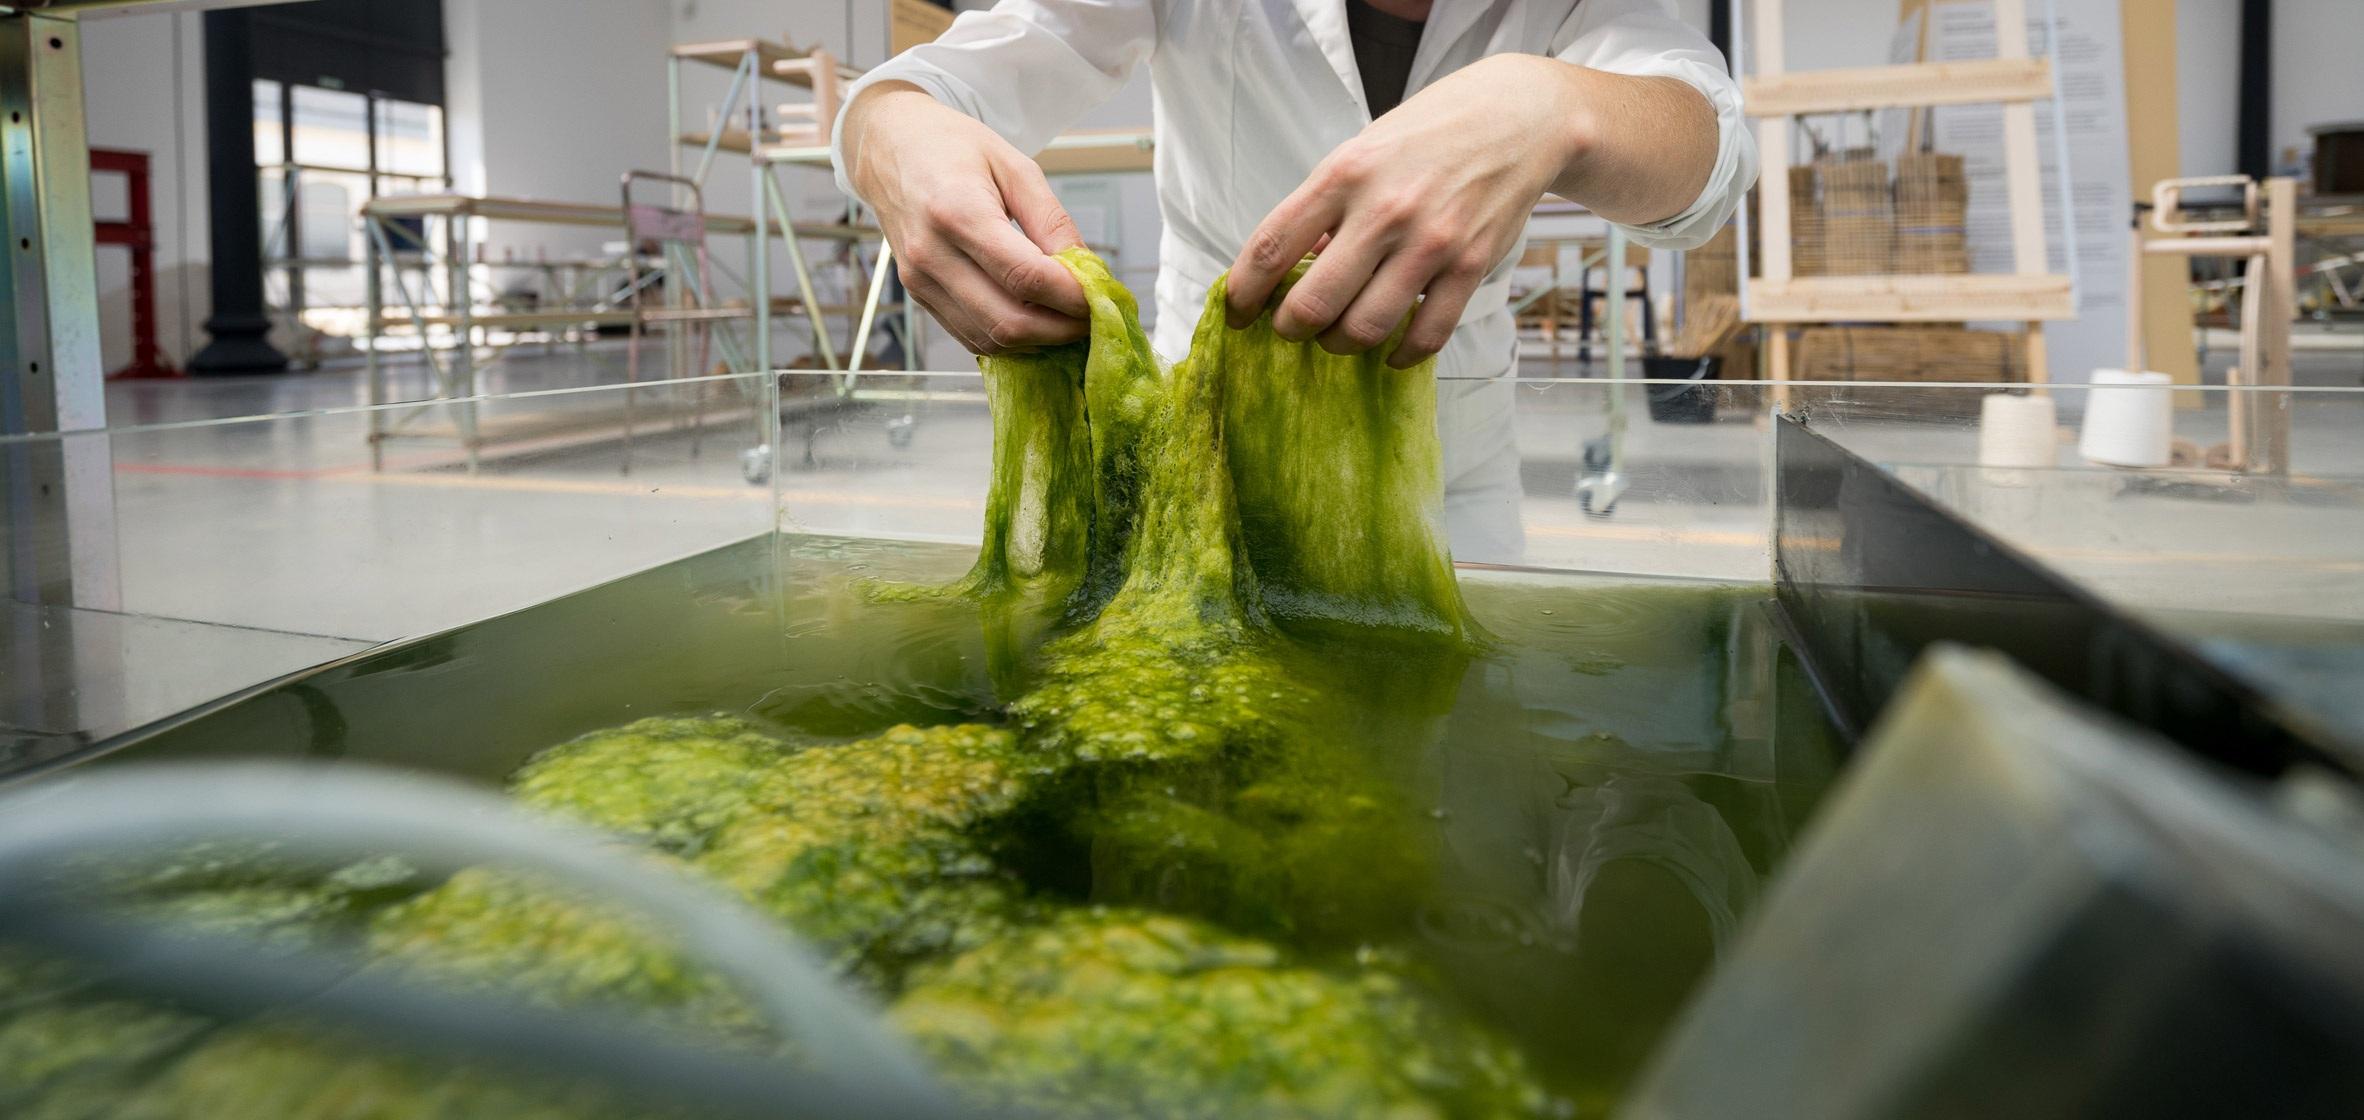 eric-klarenbeek-maartje-dros-change-system-dutch-design-week-algae_dezeen_2364_col_9.jpg